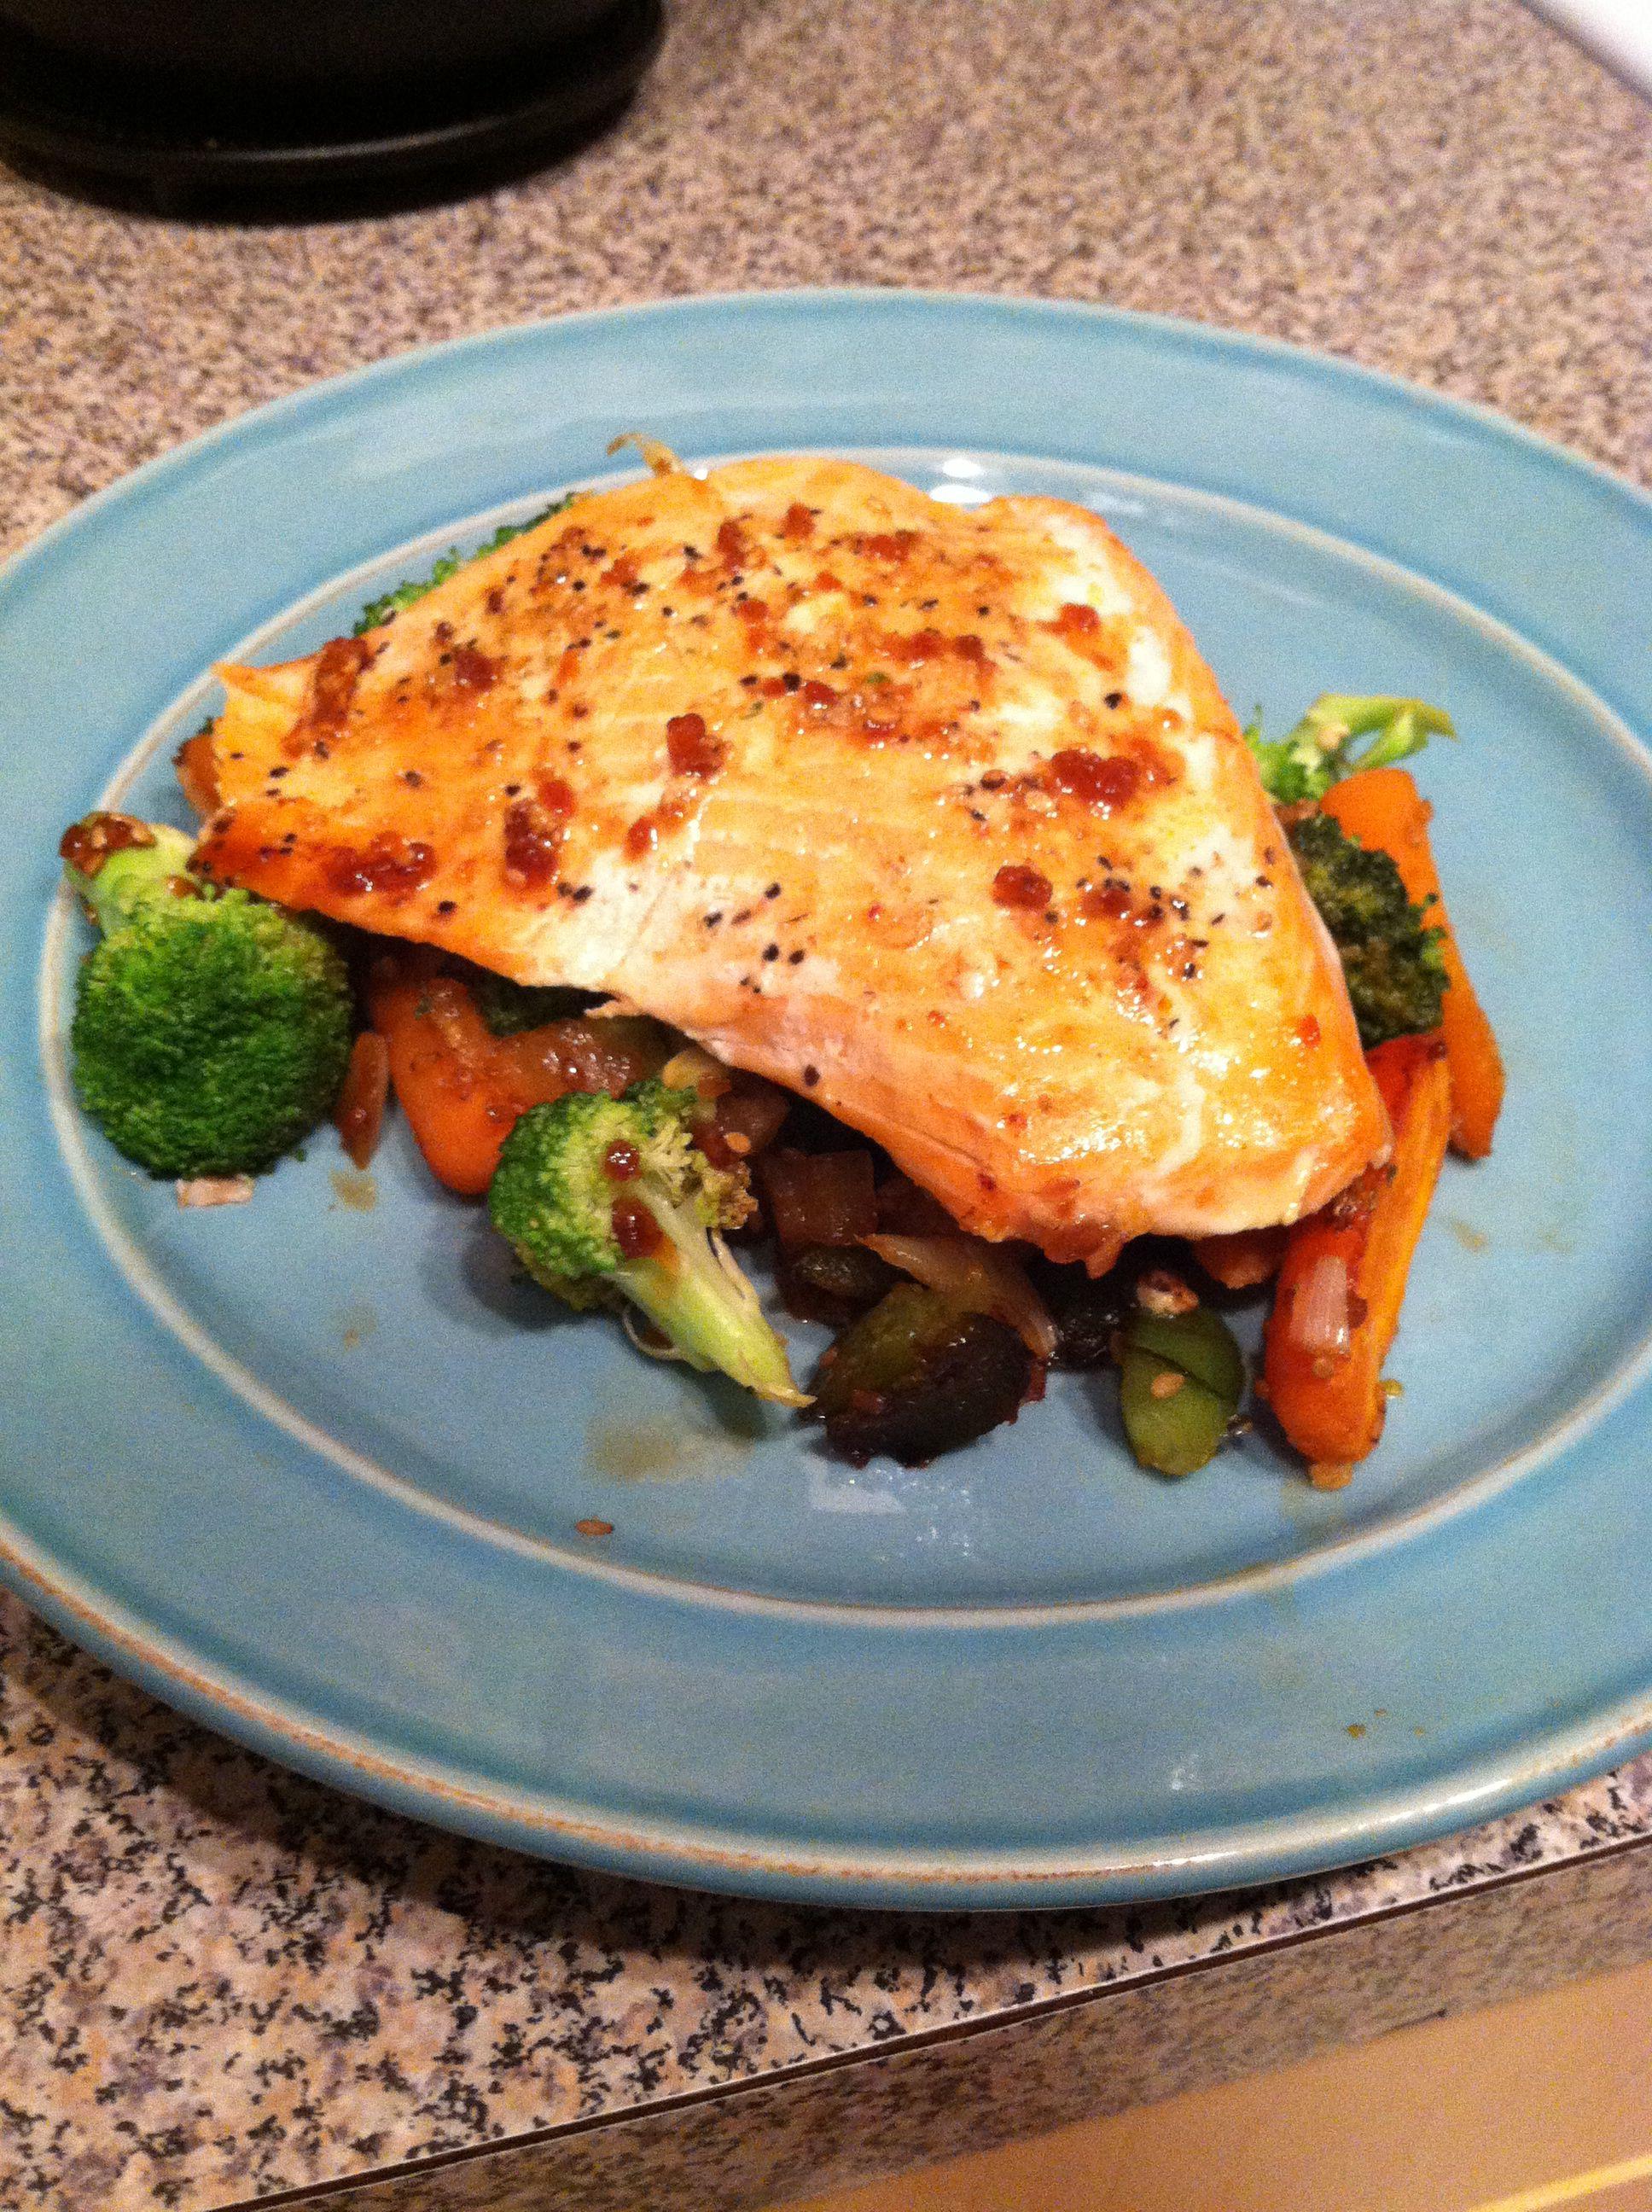 Grilled salmon over healthy stir fry veggies